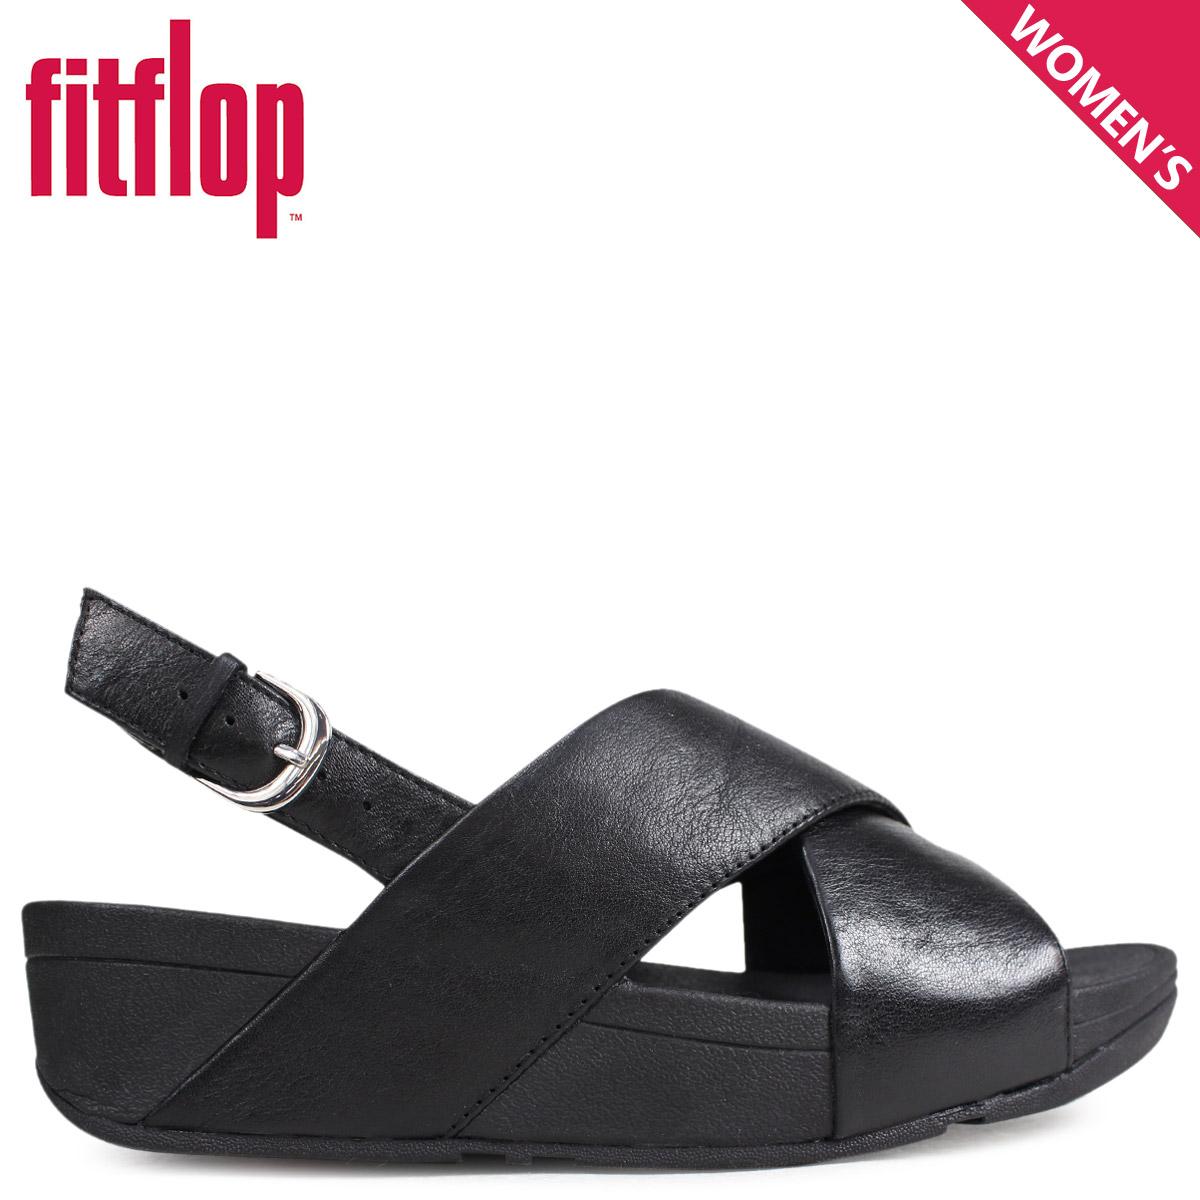 582868b98 Fitting FLOP sandals FitFlop Lulu LULU CROSS BACK-STRAP SANDALS LEATHER  Lady s K03 black  4 4 Shinnyu load